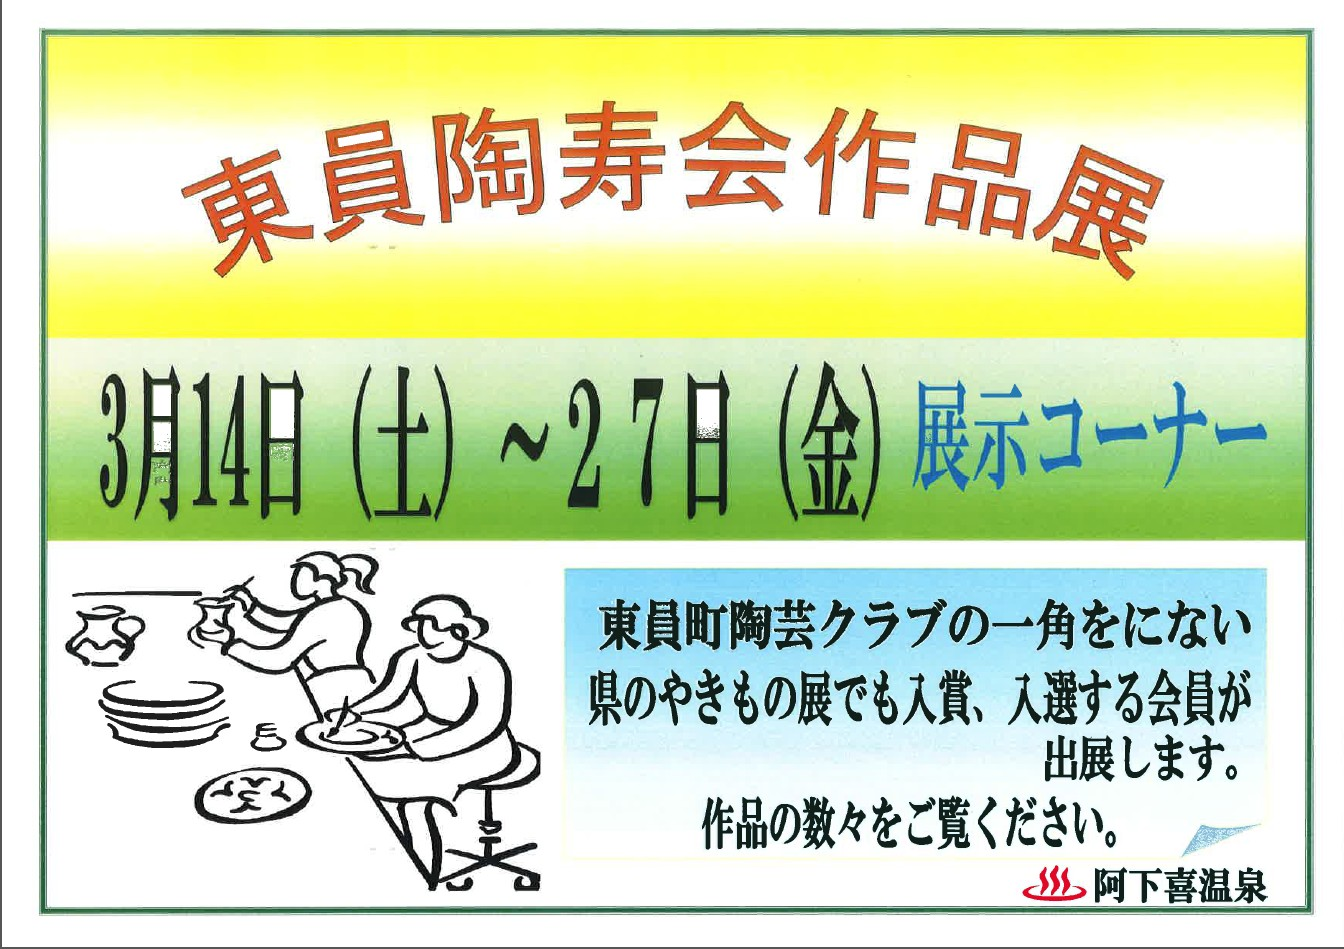 http://www.ajisainosato.com/info/images/2015y03m03d_142737394.jpg